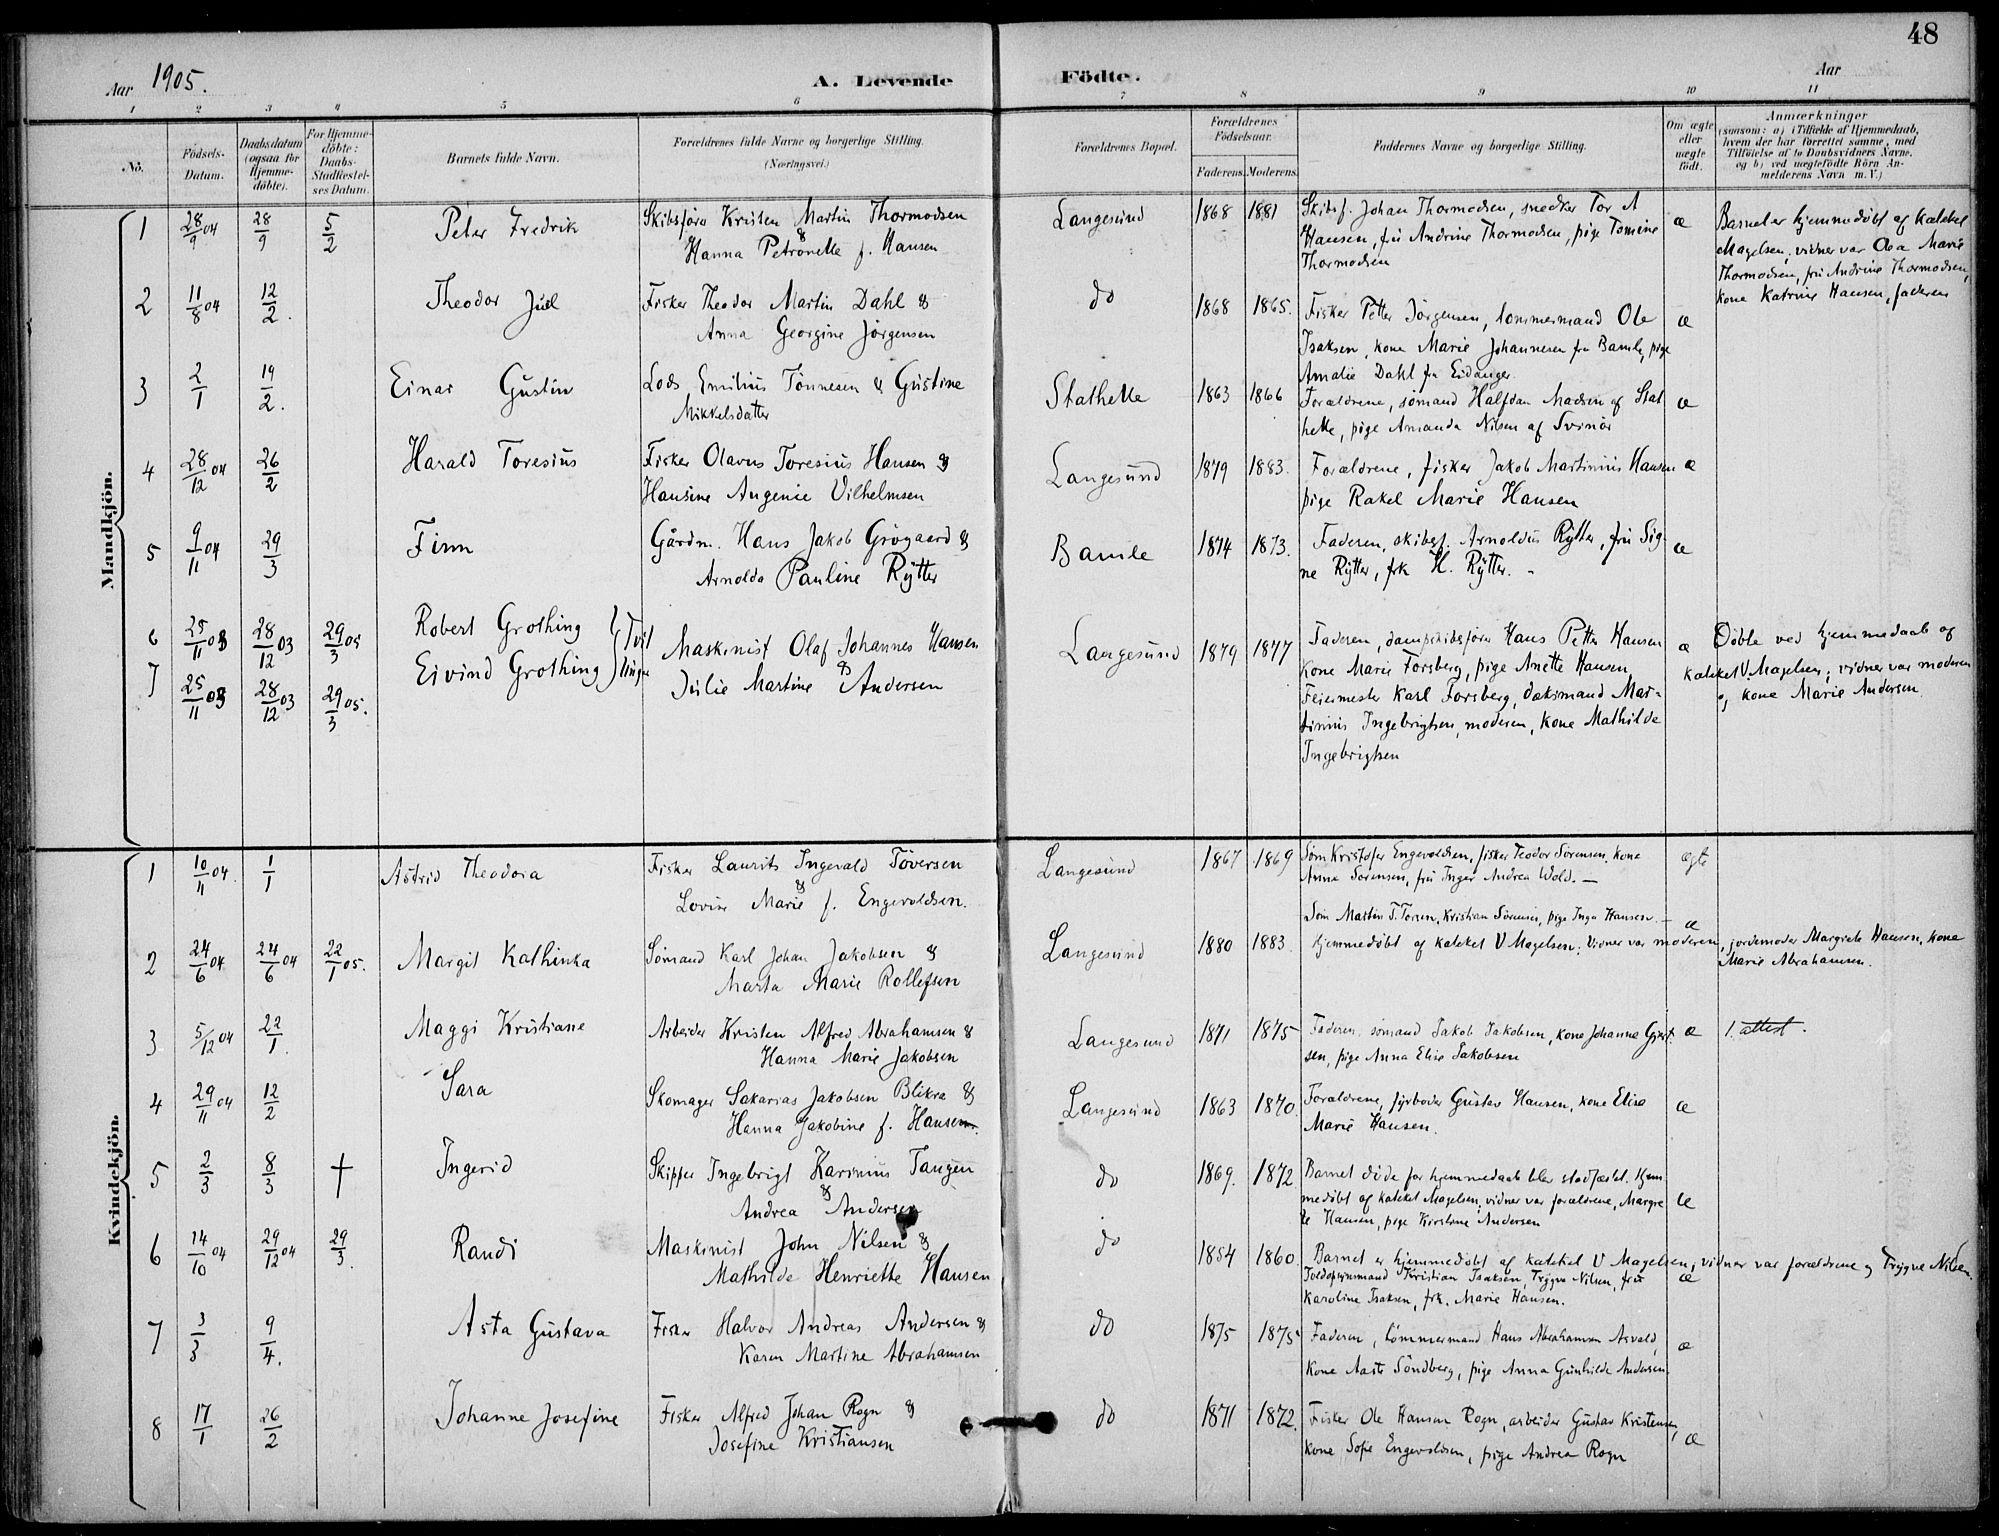 SAKO, Langesund kirkebøker, F/Fa/L0003: Ministerialbok nr. 3, 1893-1907, s. 48